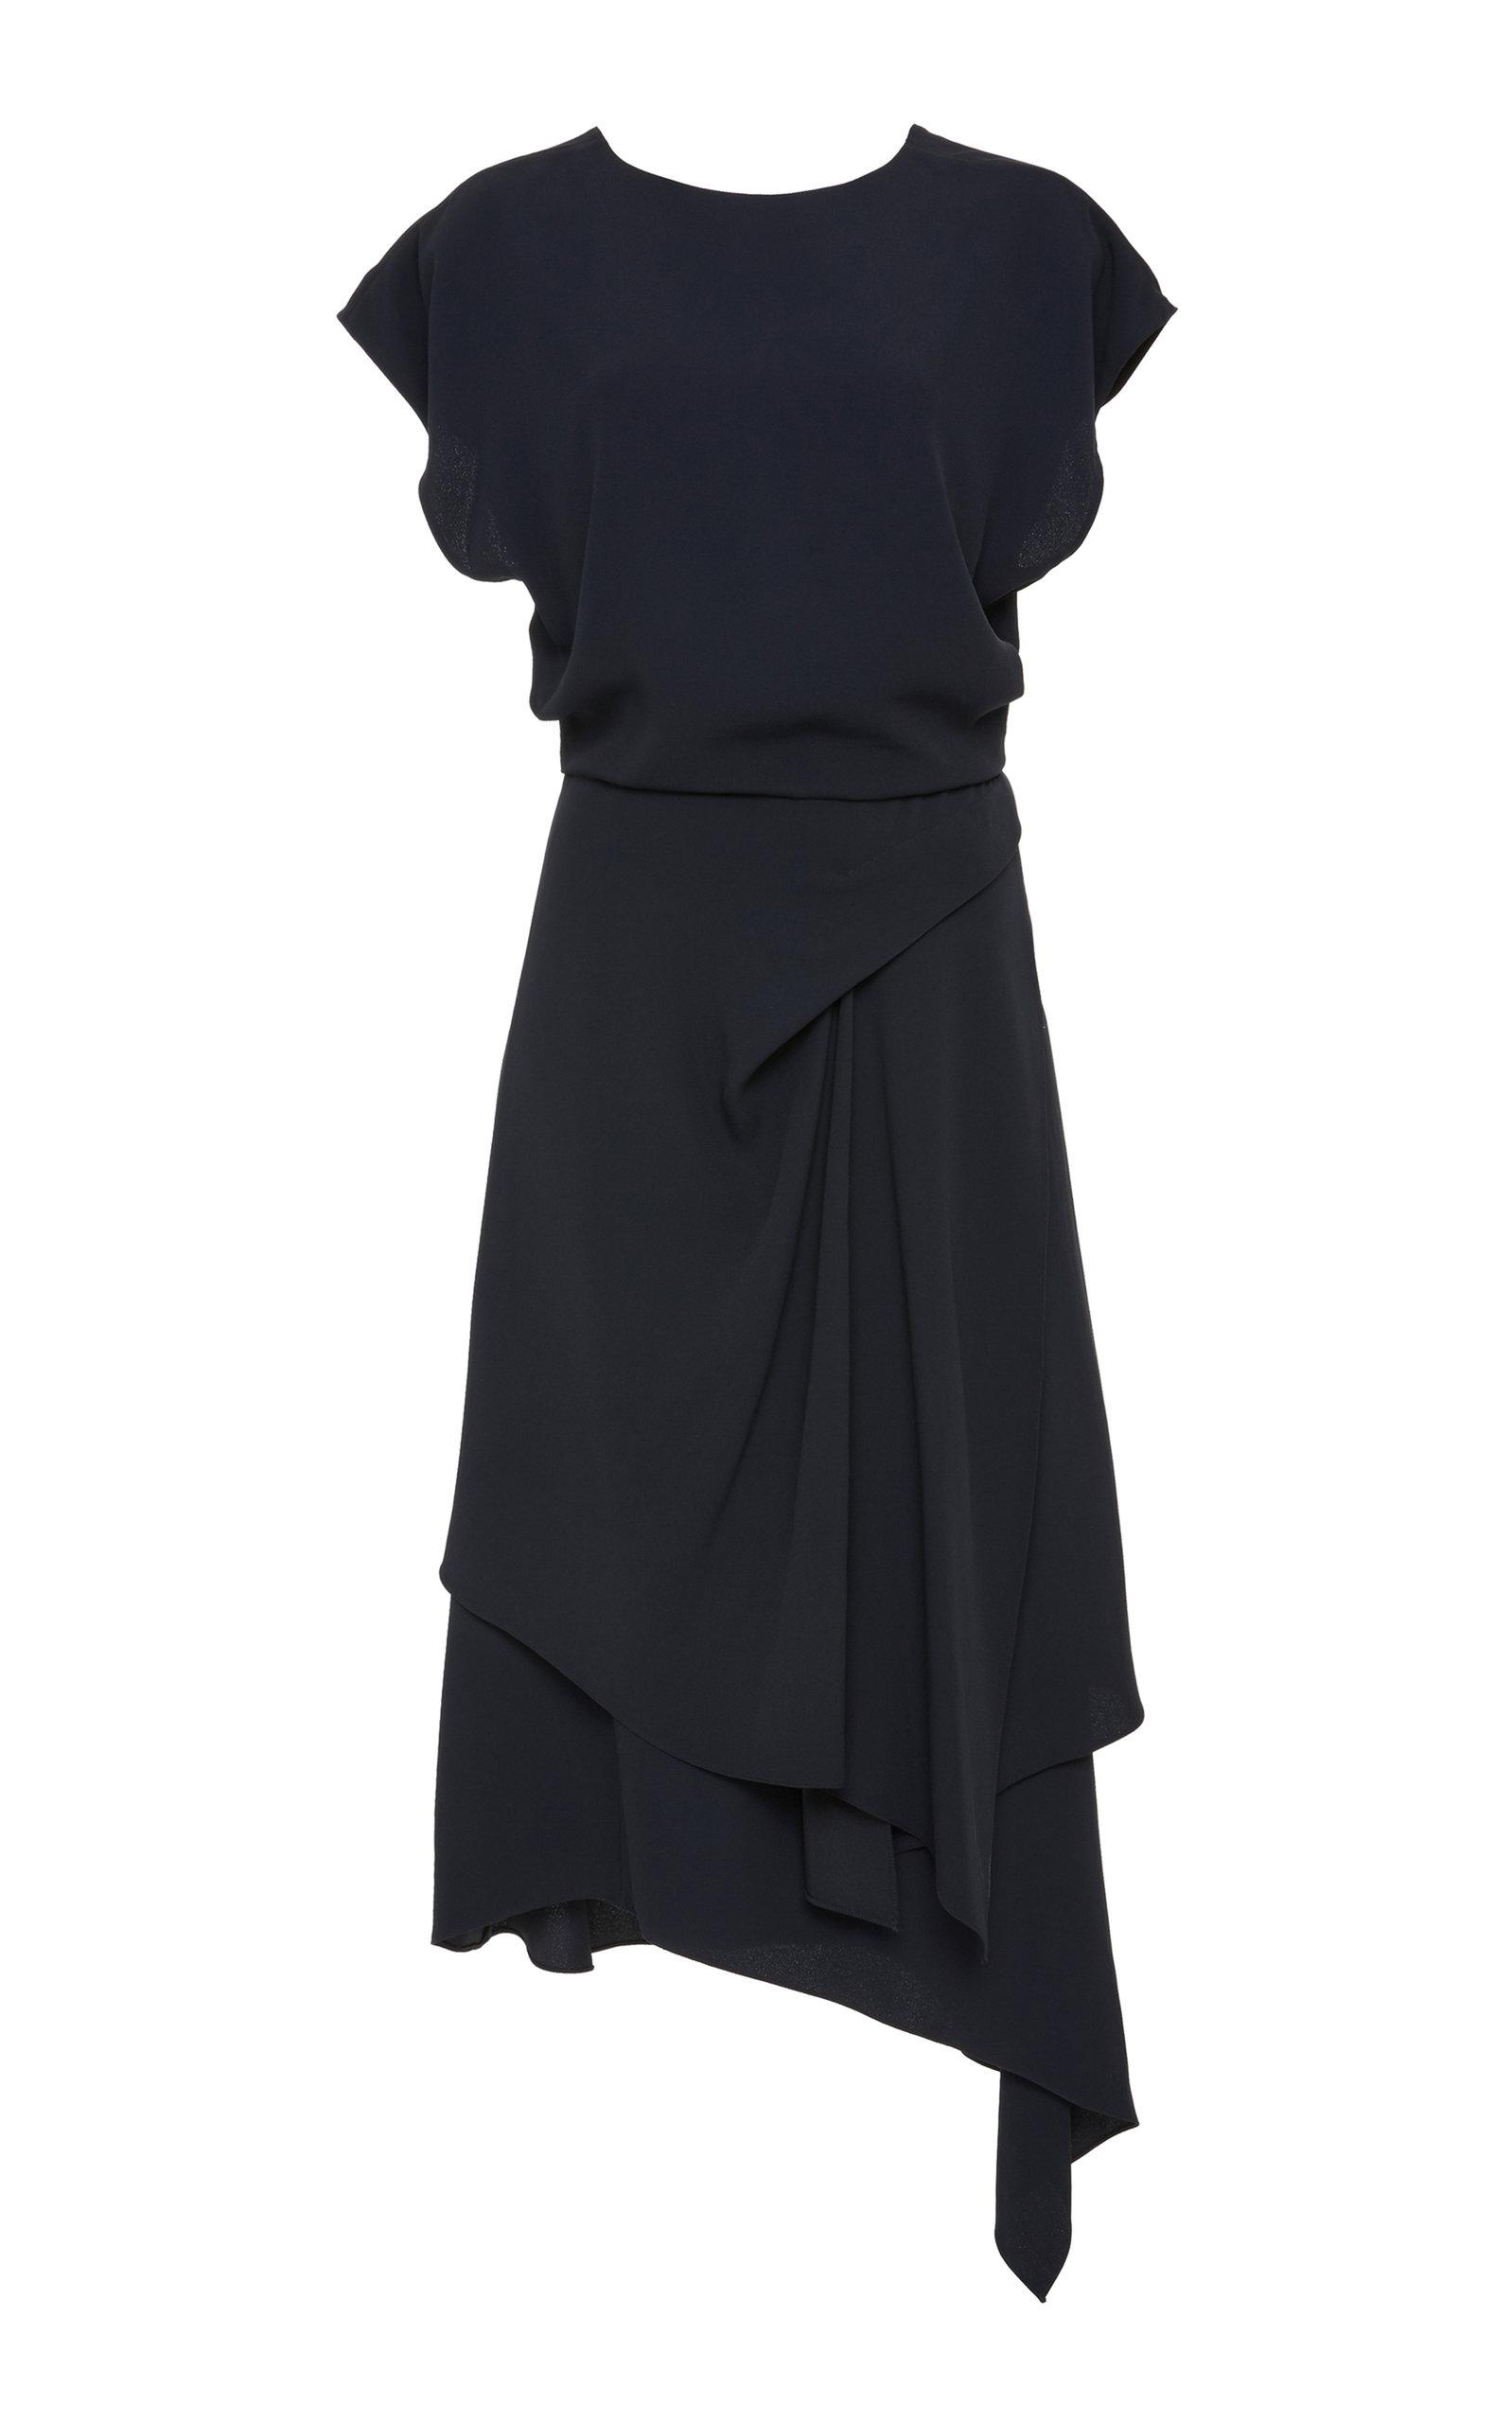 YEON TERPSICHORE ASYMMETRIC CREPE DRESS